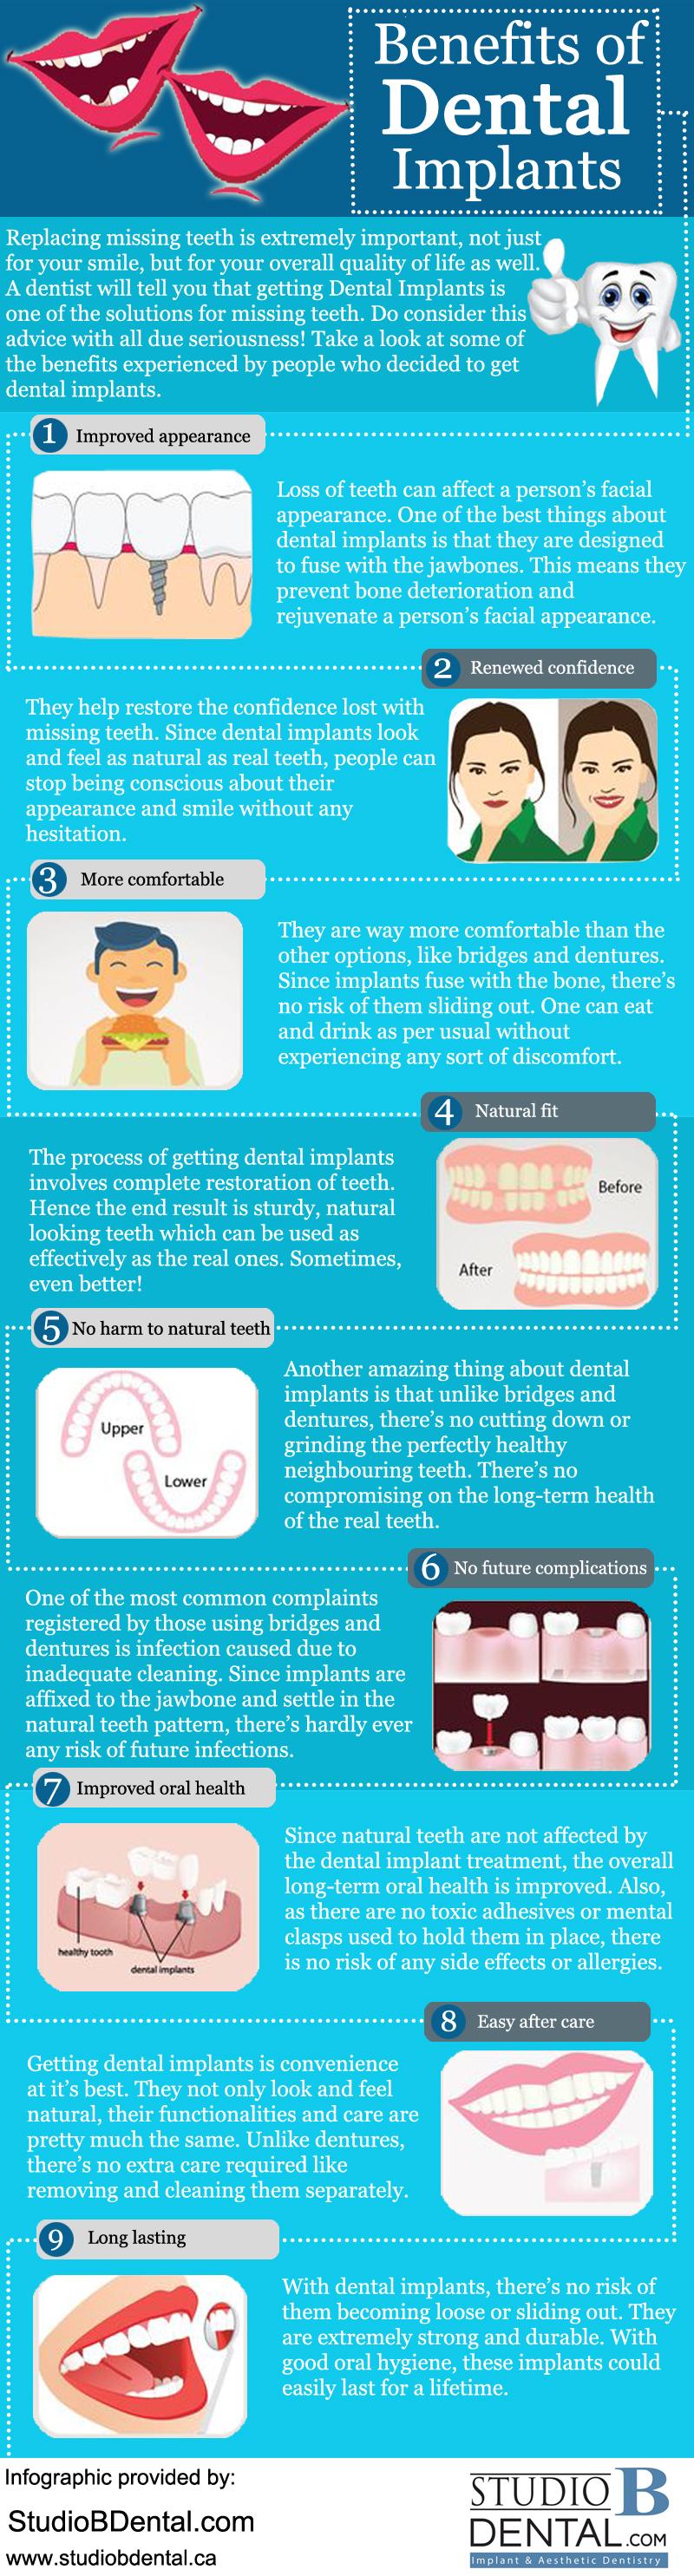 Studio B Dental offers a number of dental implant